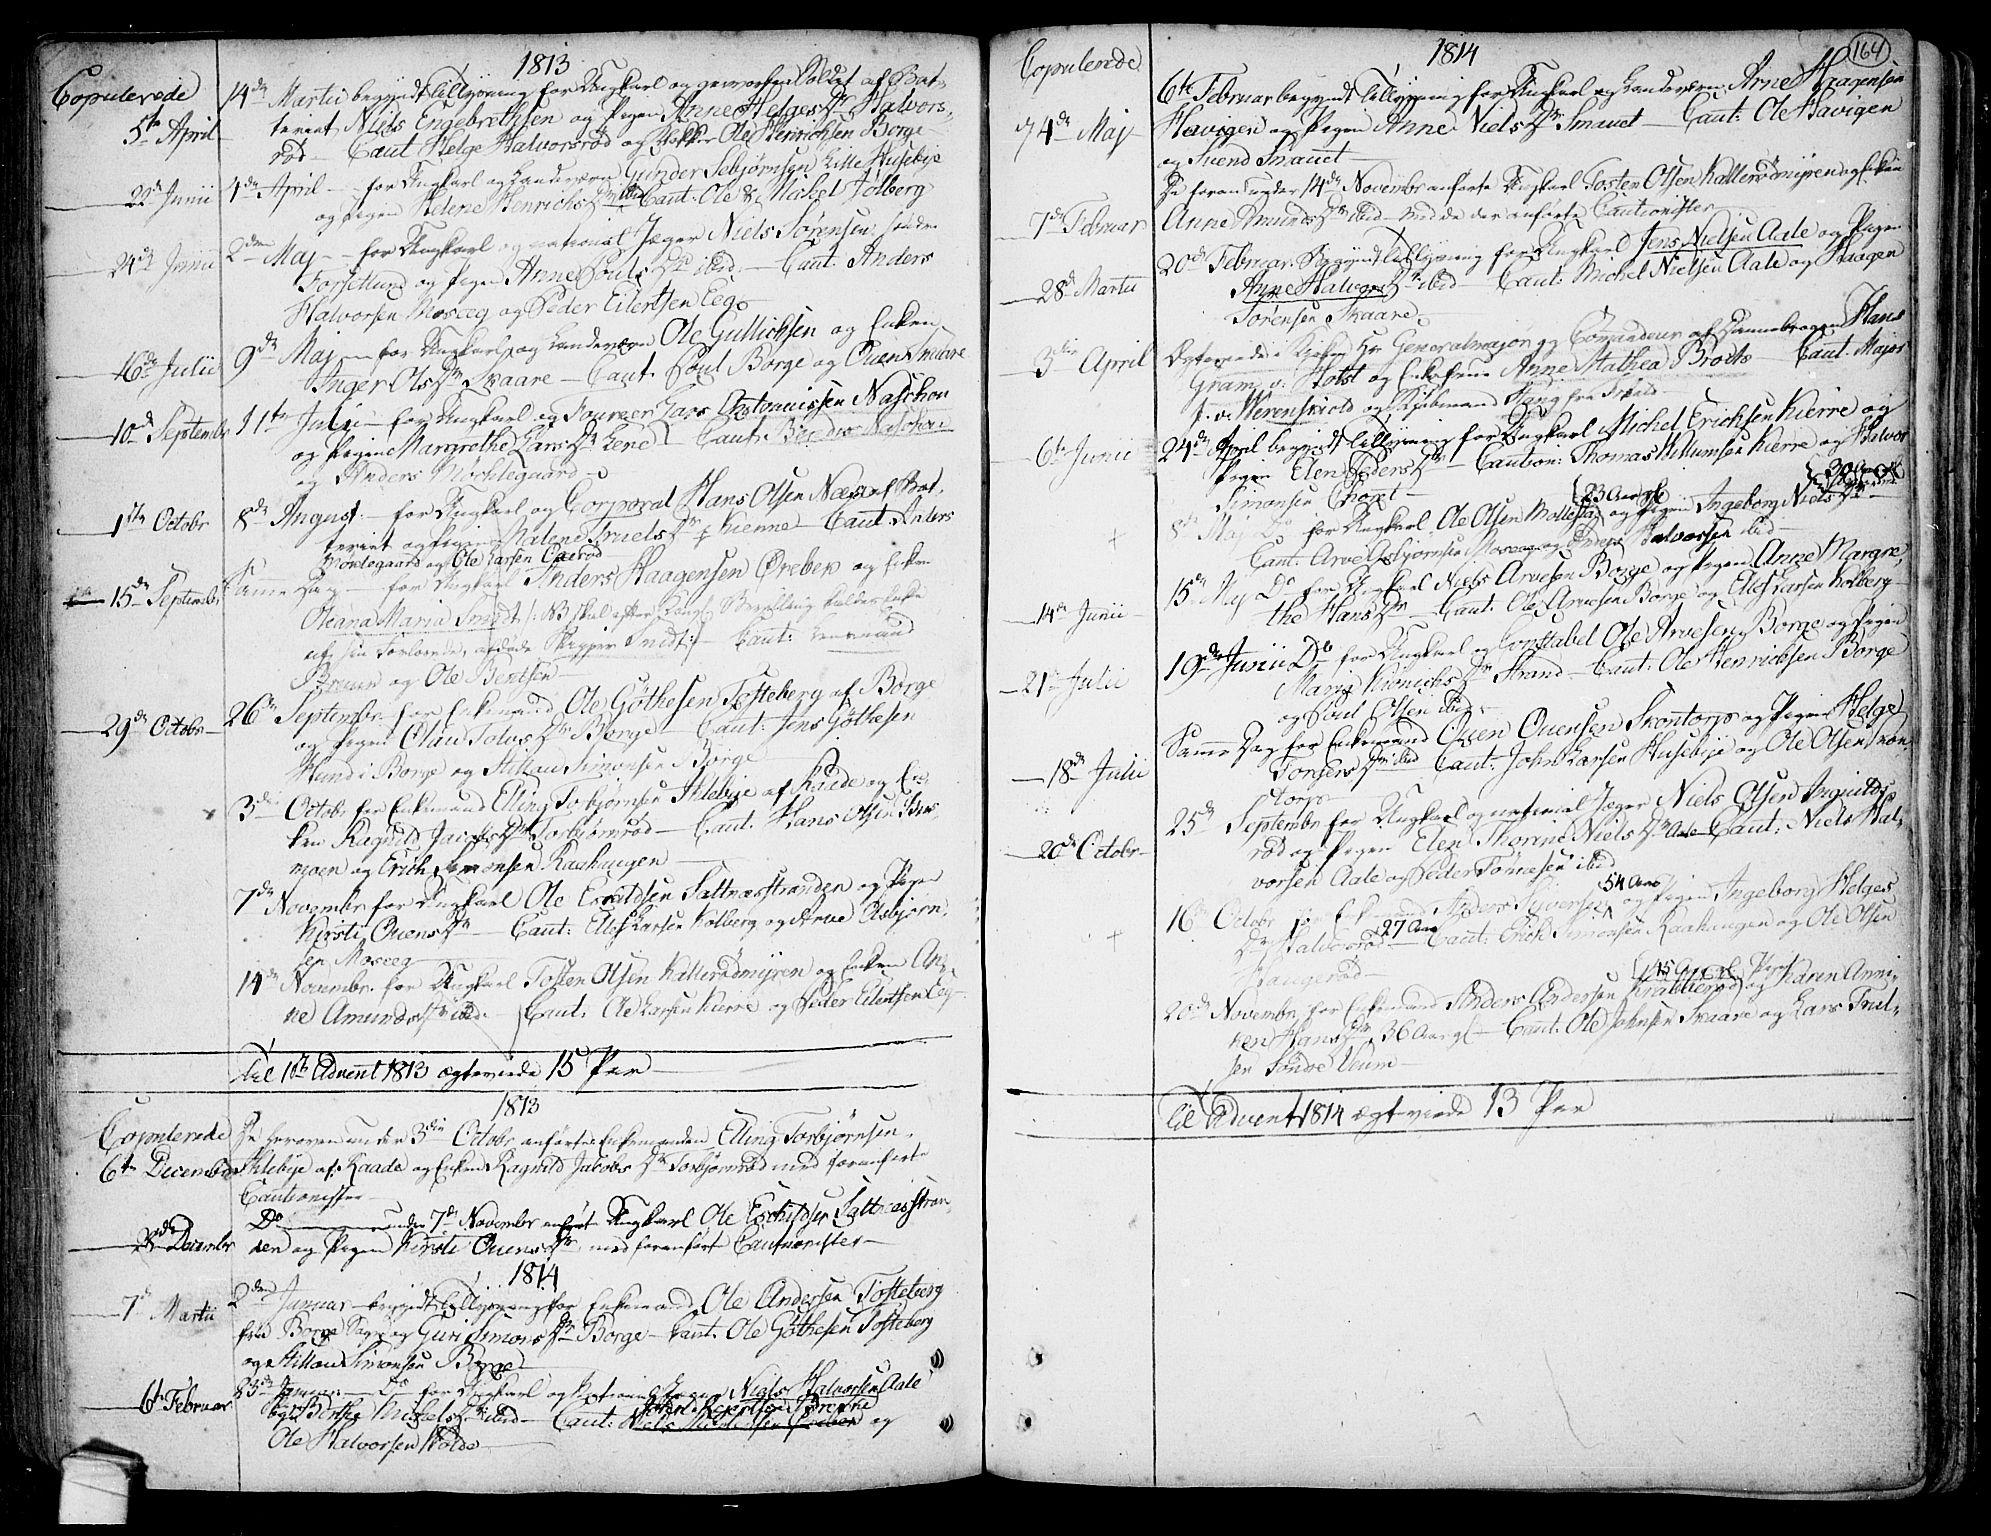 SAO, Onsøy prestekontor Kirkebøker, F/Fa/L0001: Ministerialbok nr. I 1, 1733-1814, s. 164